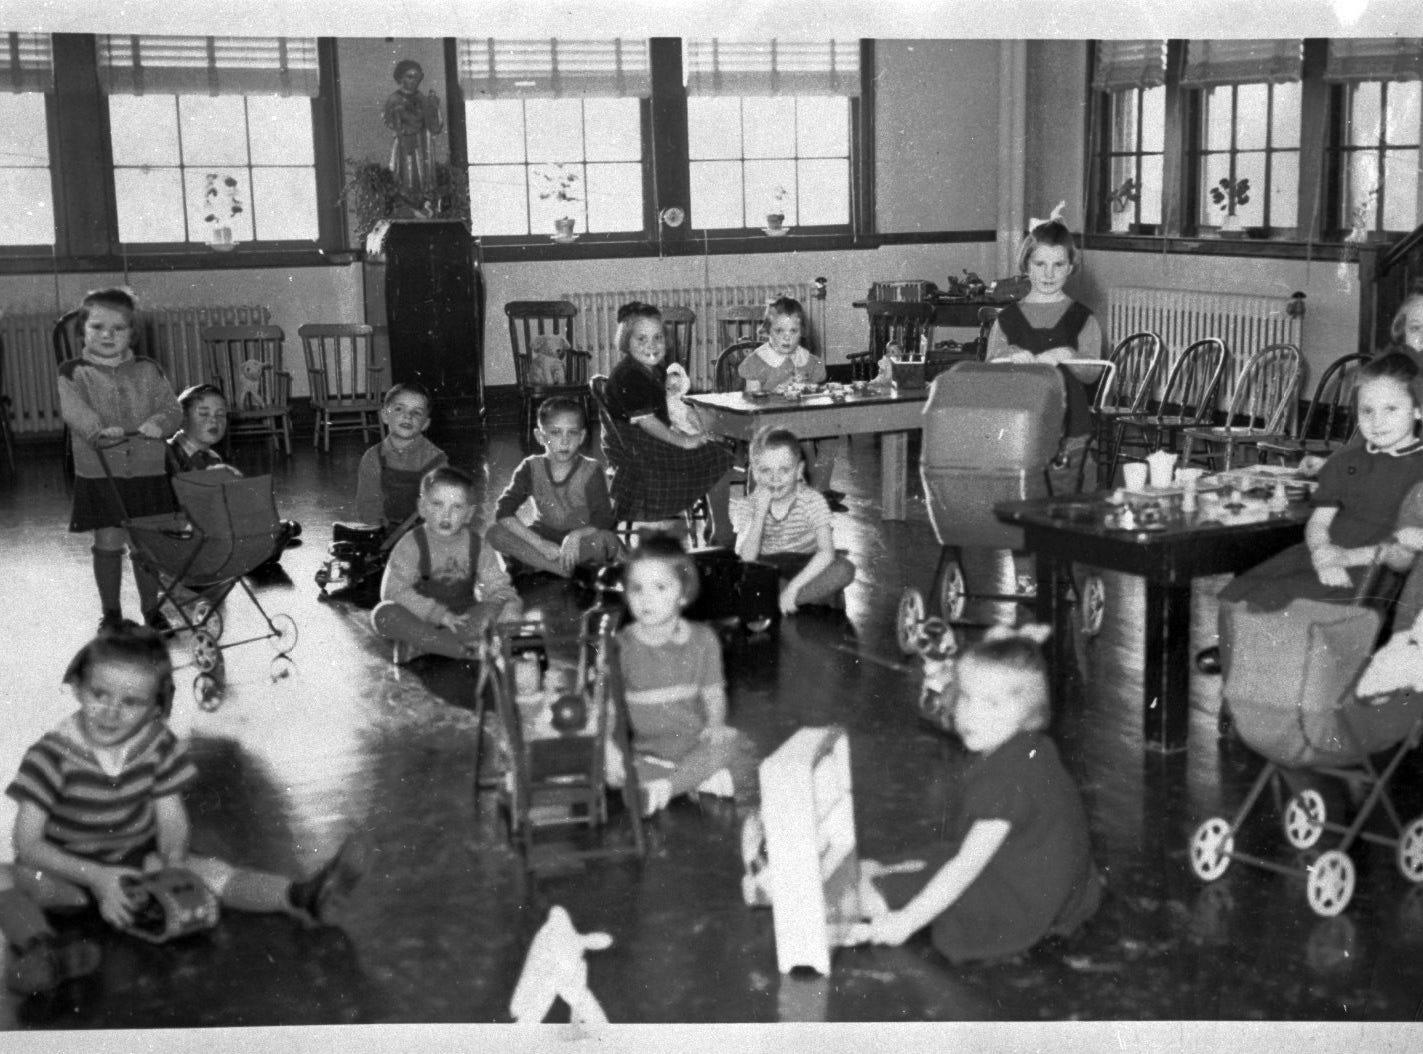 File photo of St. Joseph's Orphanage in Burlington, Vermont.